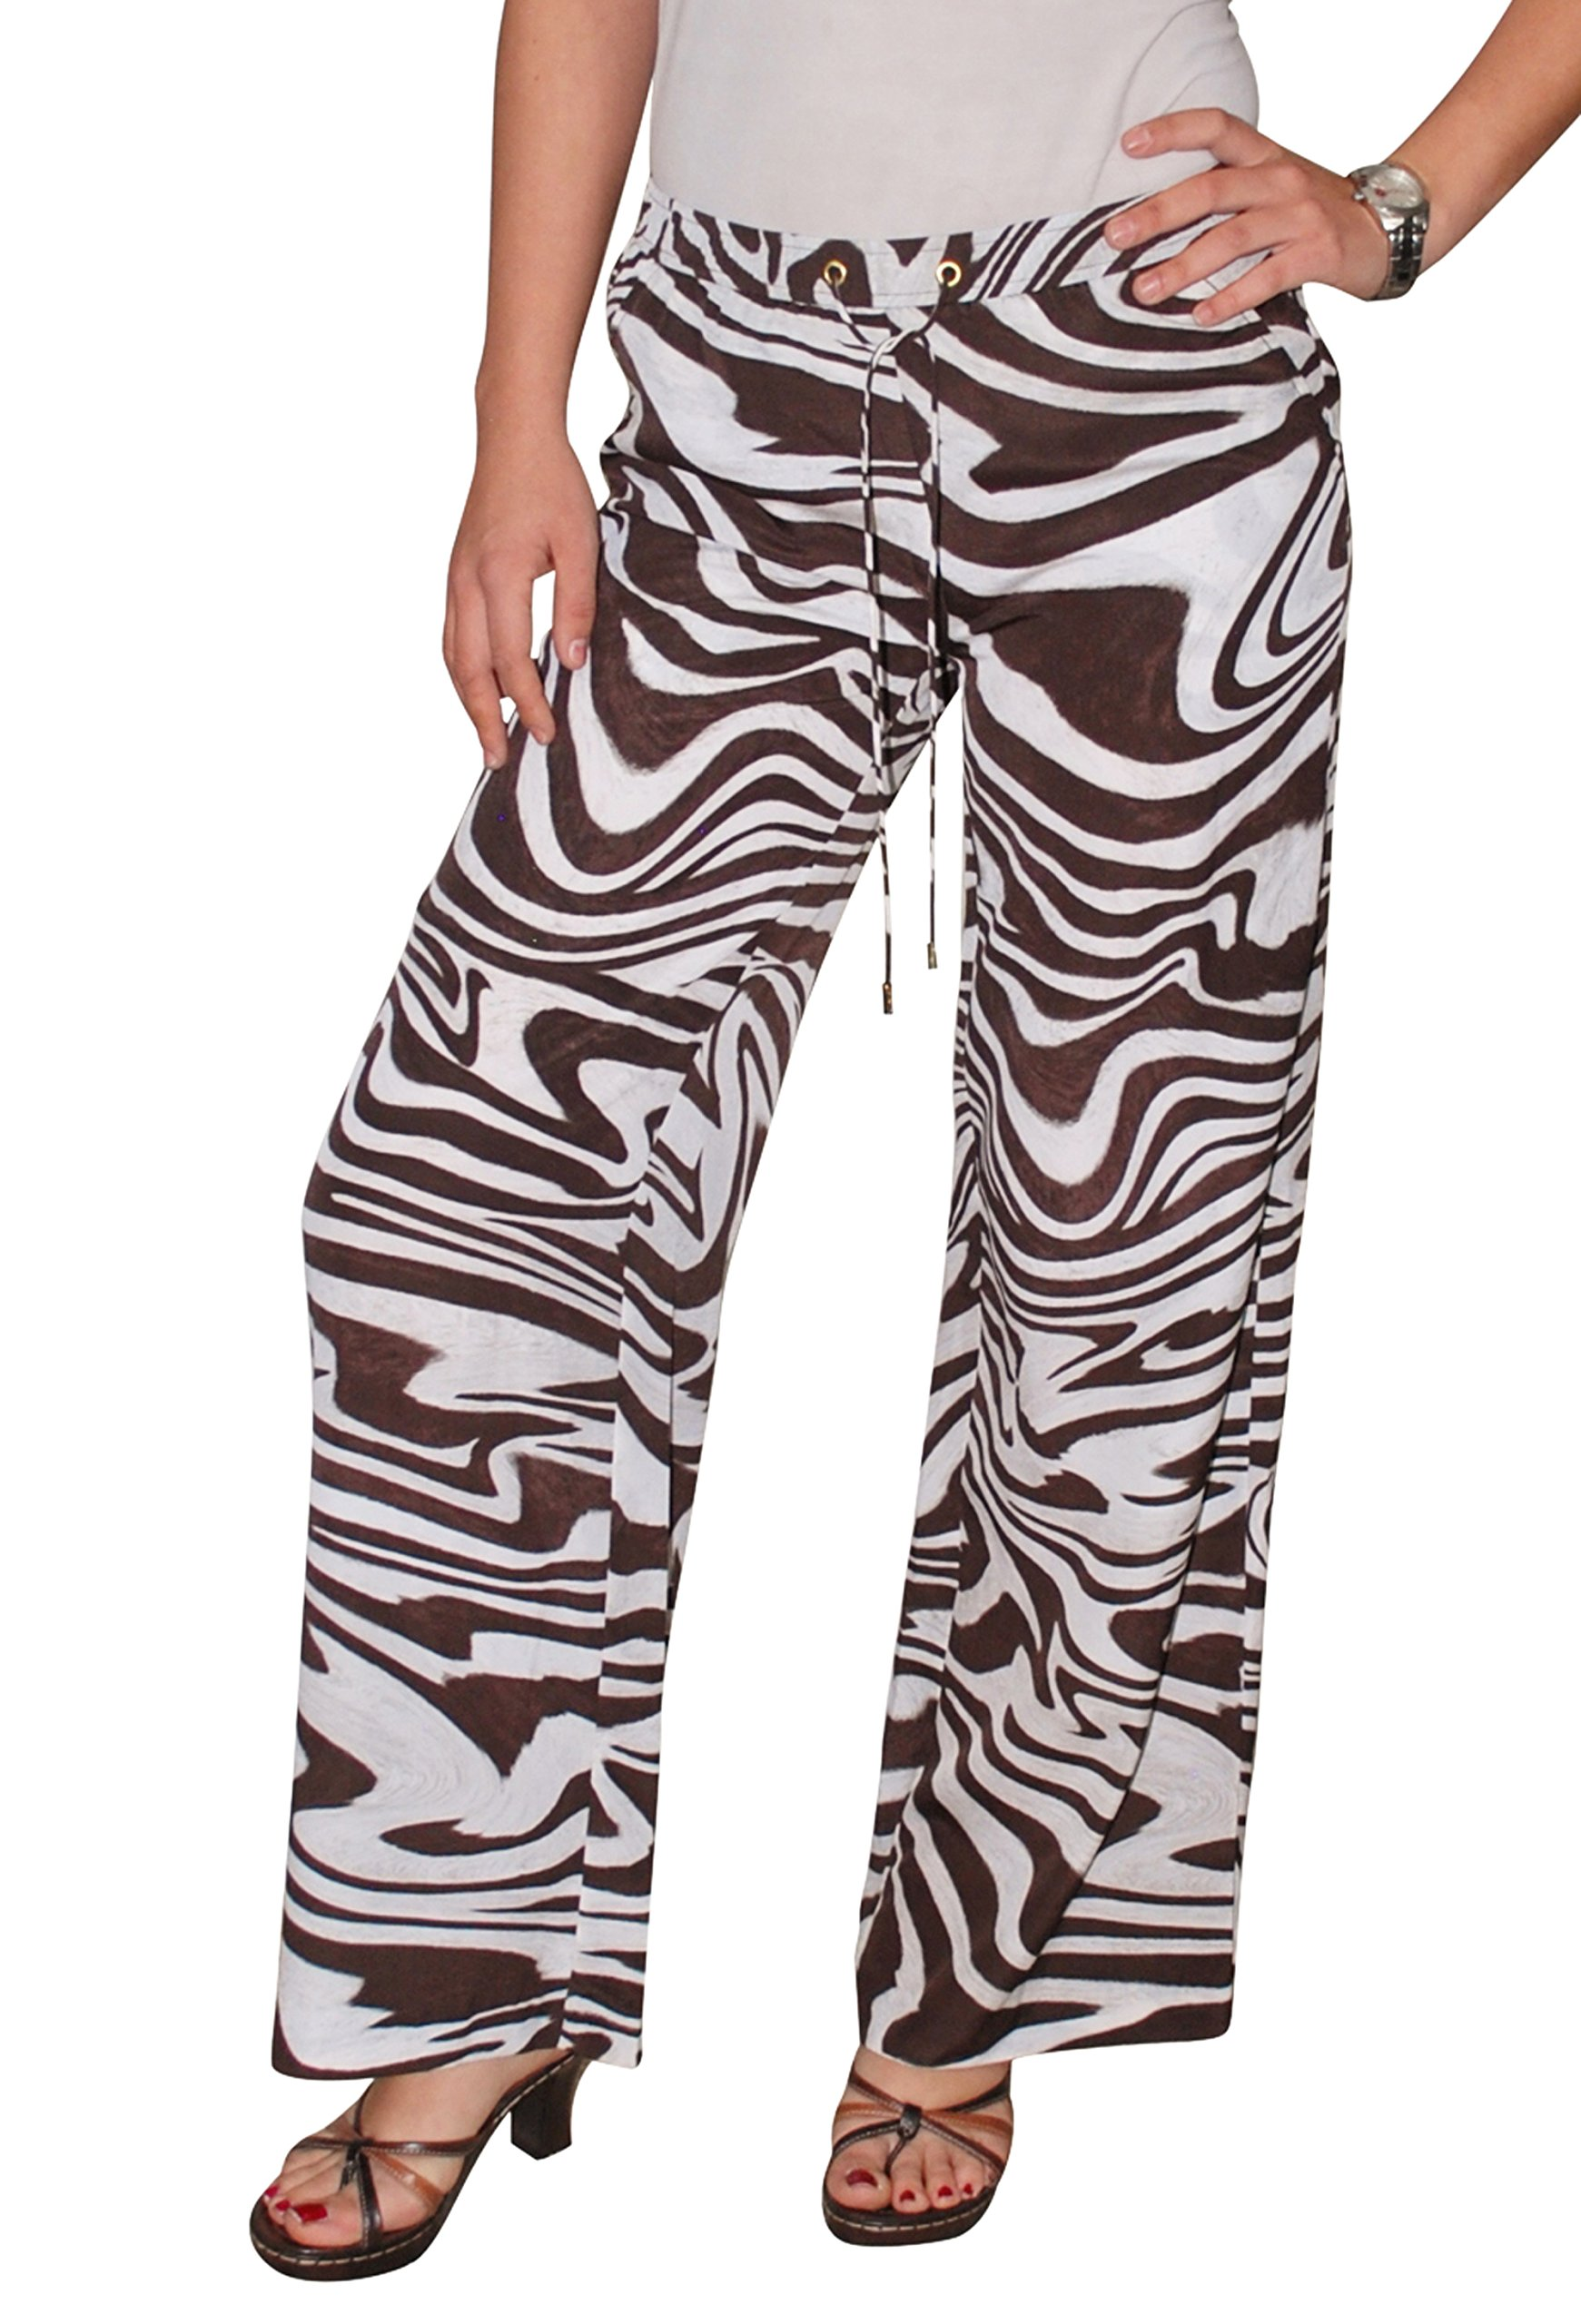 Michael Kors Women`s Wide Leg Animal Print Pants Chocolate (6P) by Michael Kors